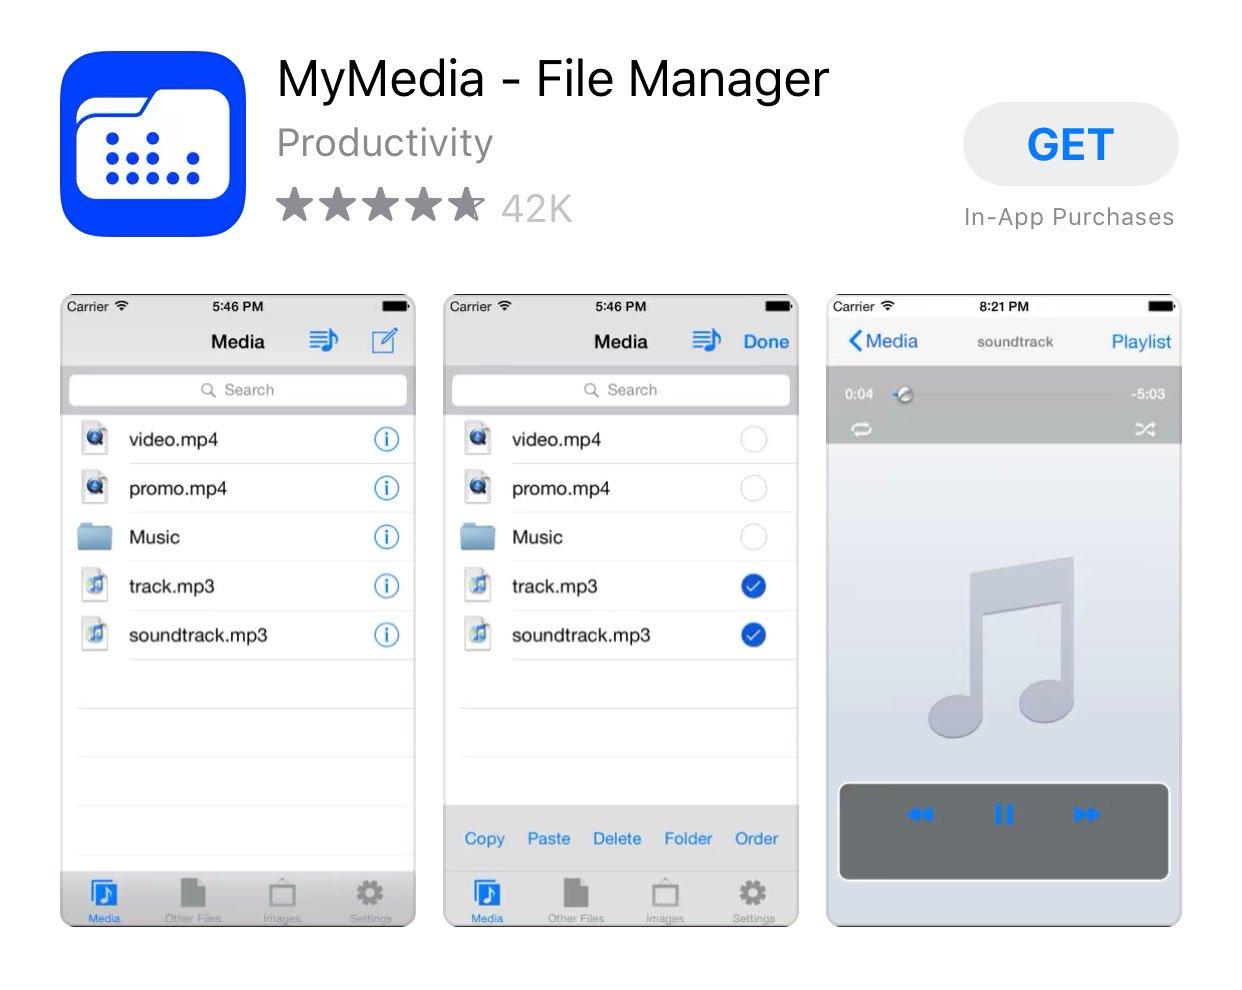 mymedia app